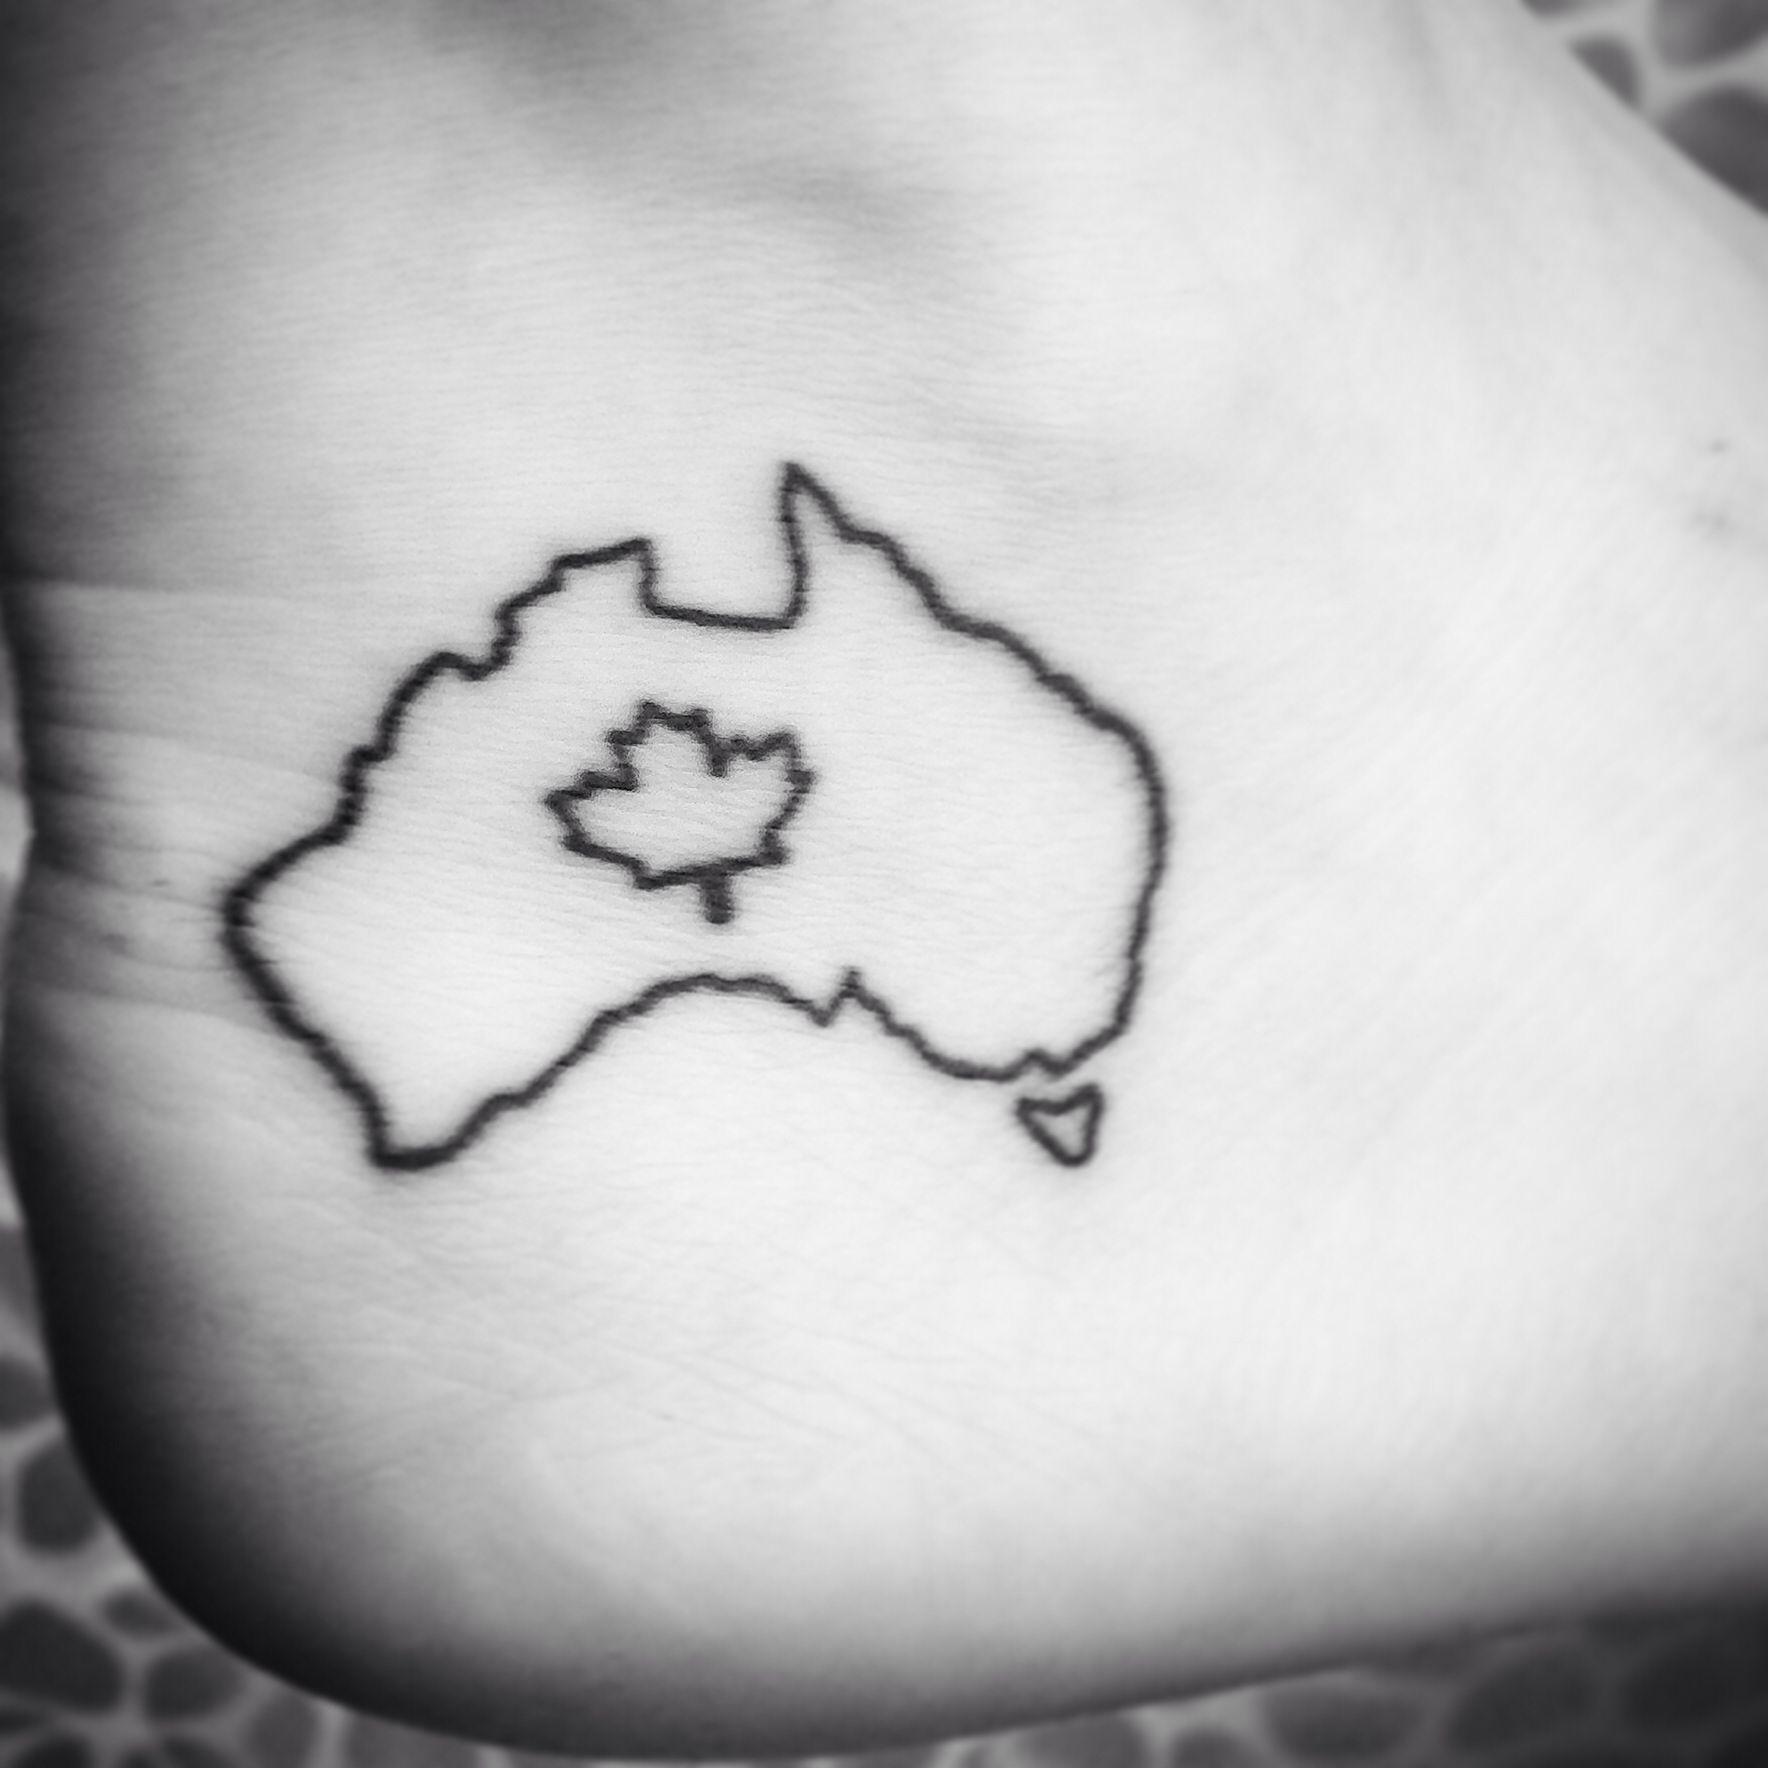 half australian half canadian small on my ankle